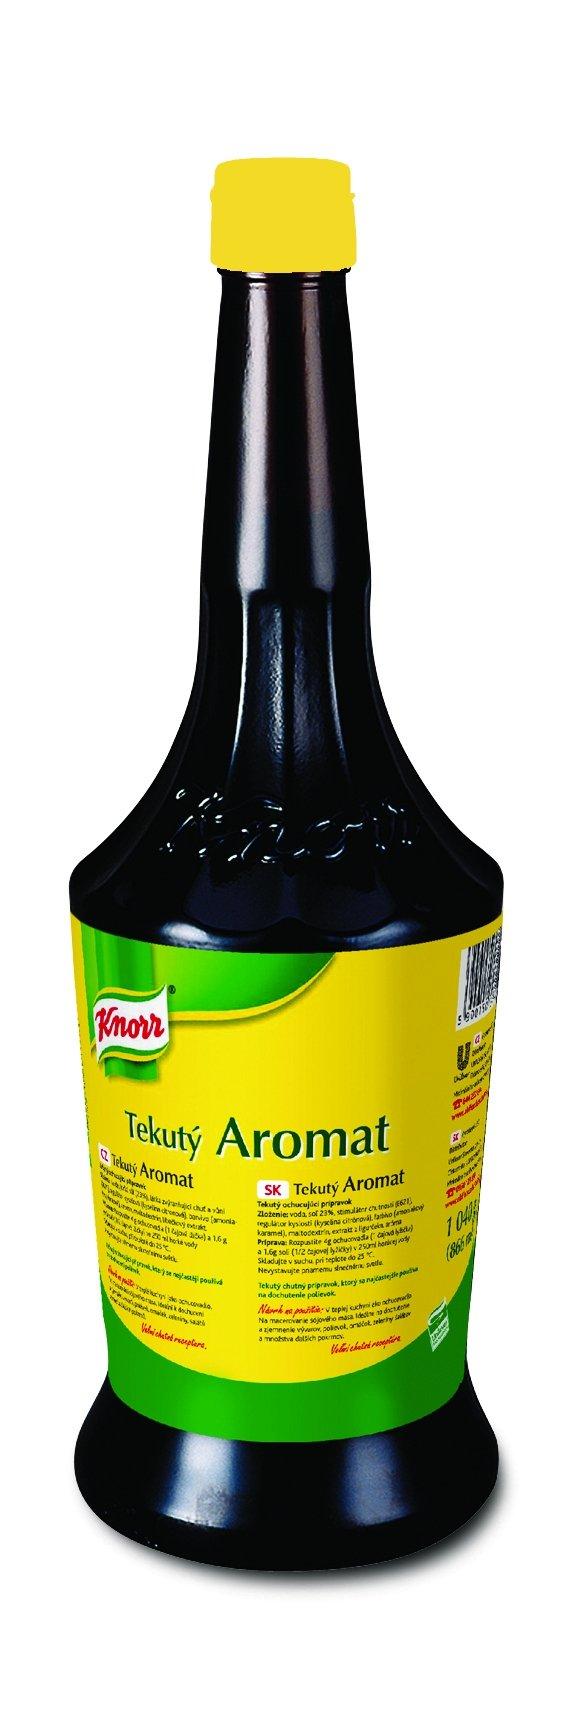 Knorr Tekutý Aromat 1,04 kg